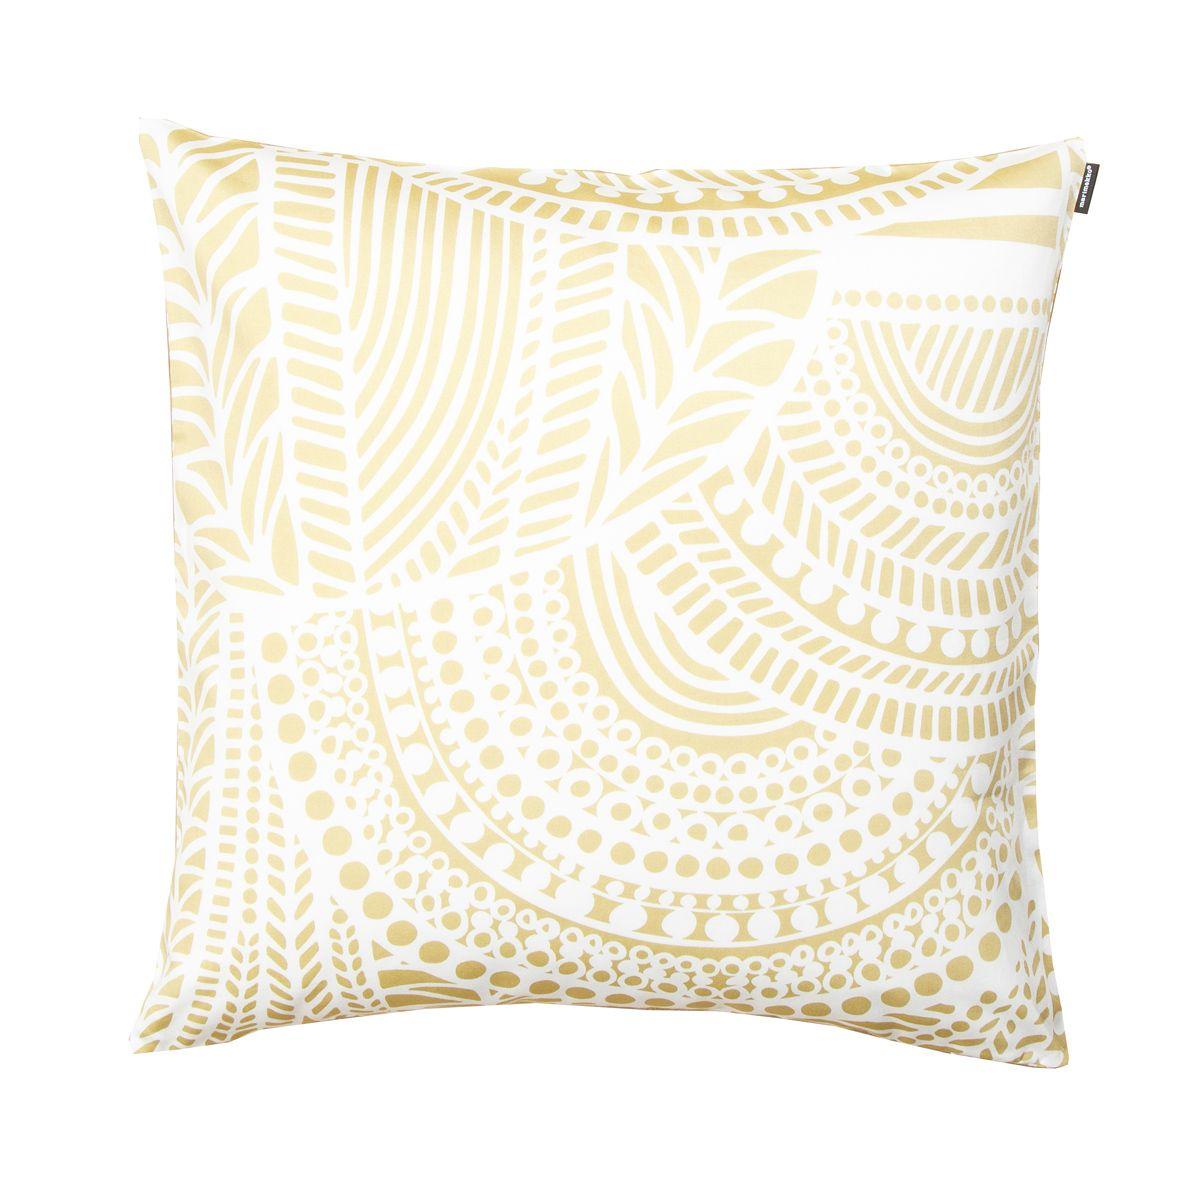 Marimekko Vuorilaakso White Gold Throw Pillow Marimekko Home